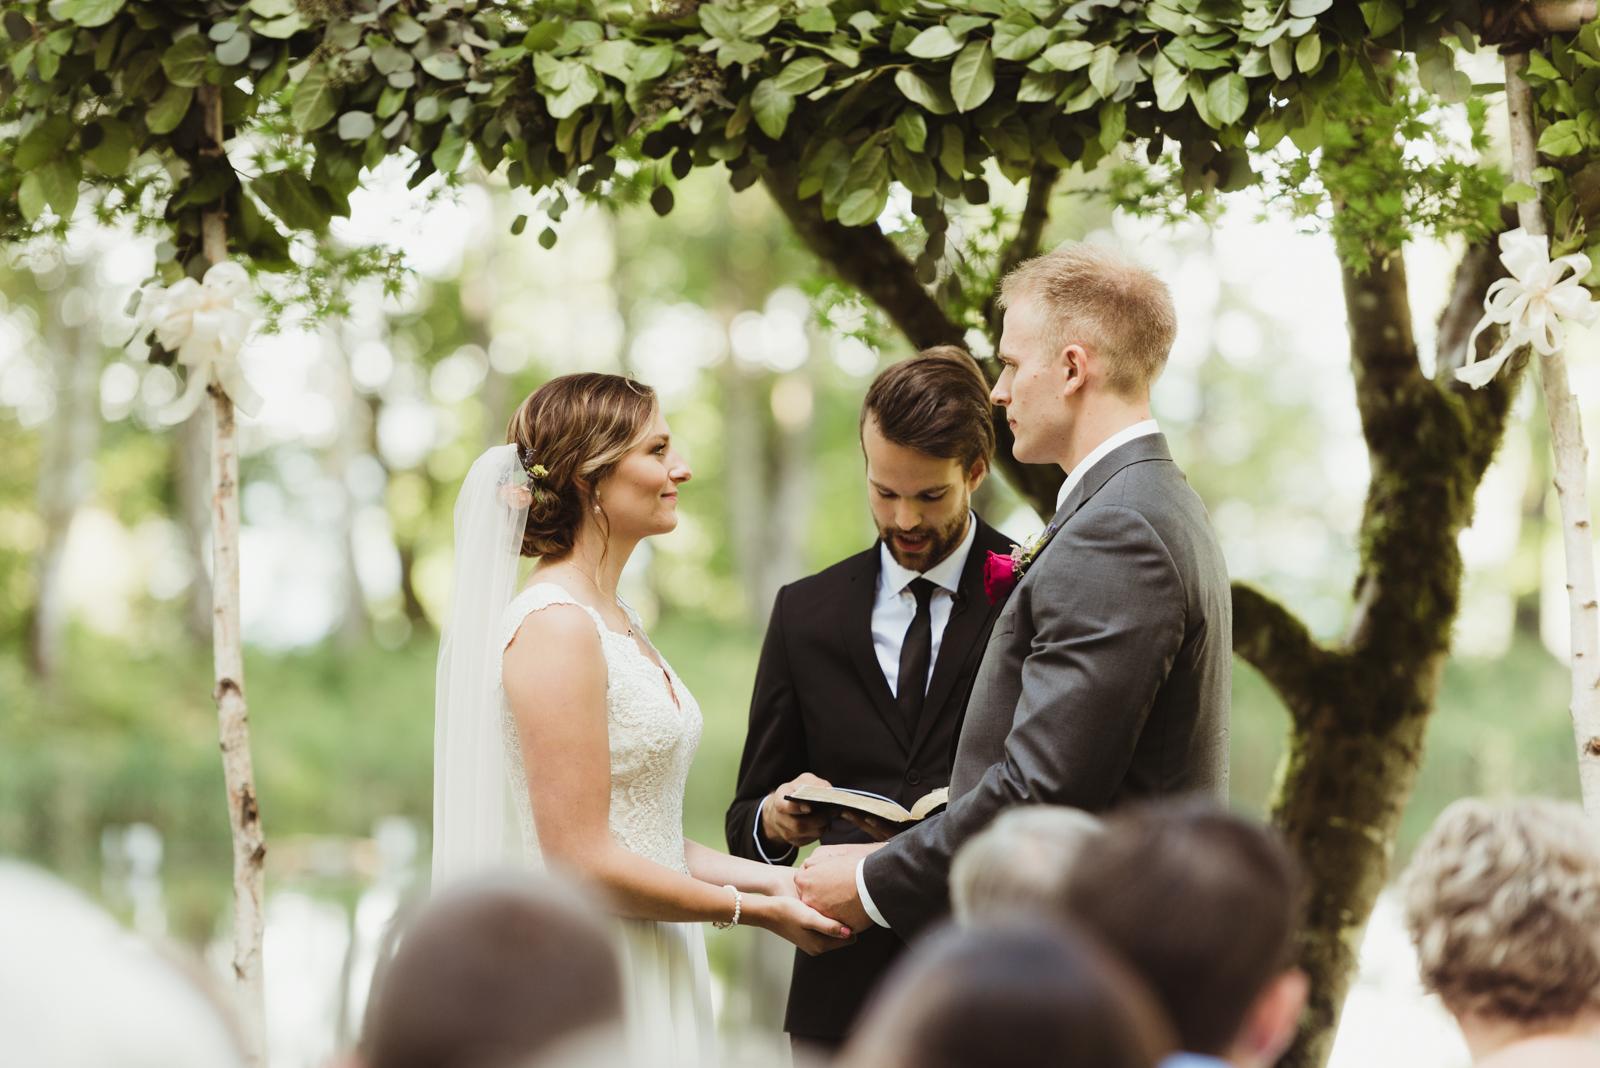 beautiful wedding ceremony at Bridal Veil Lakes